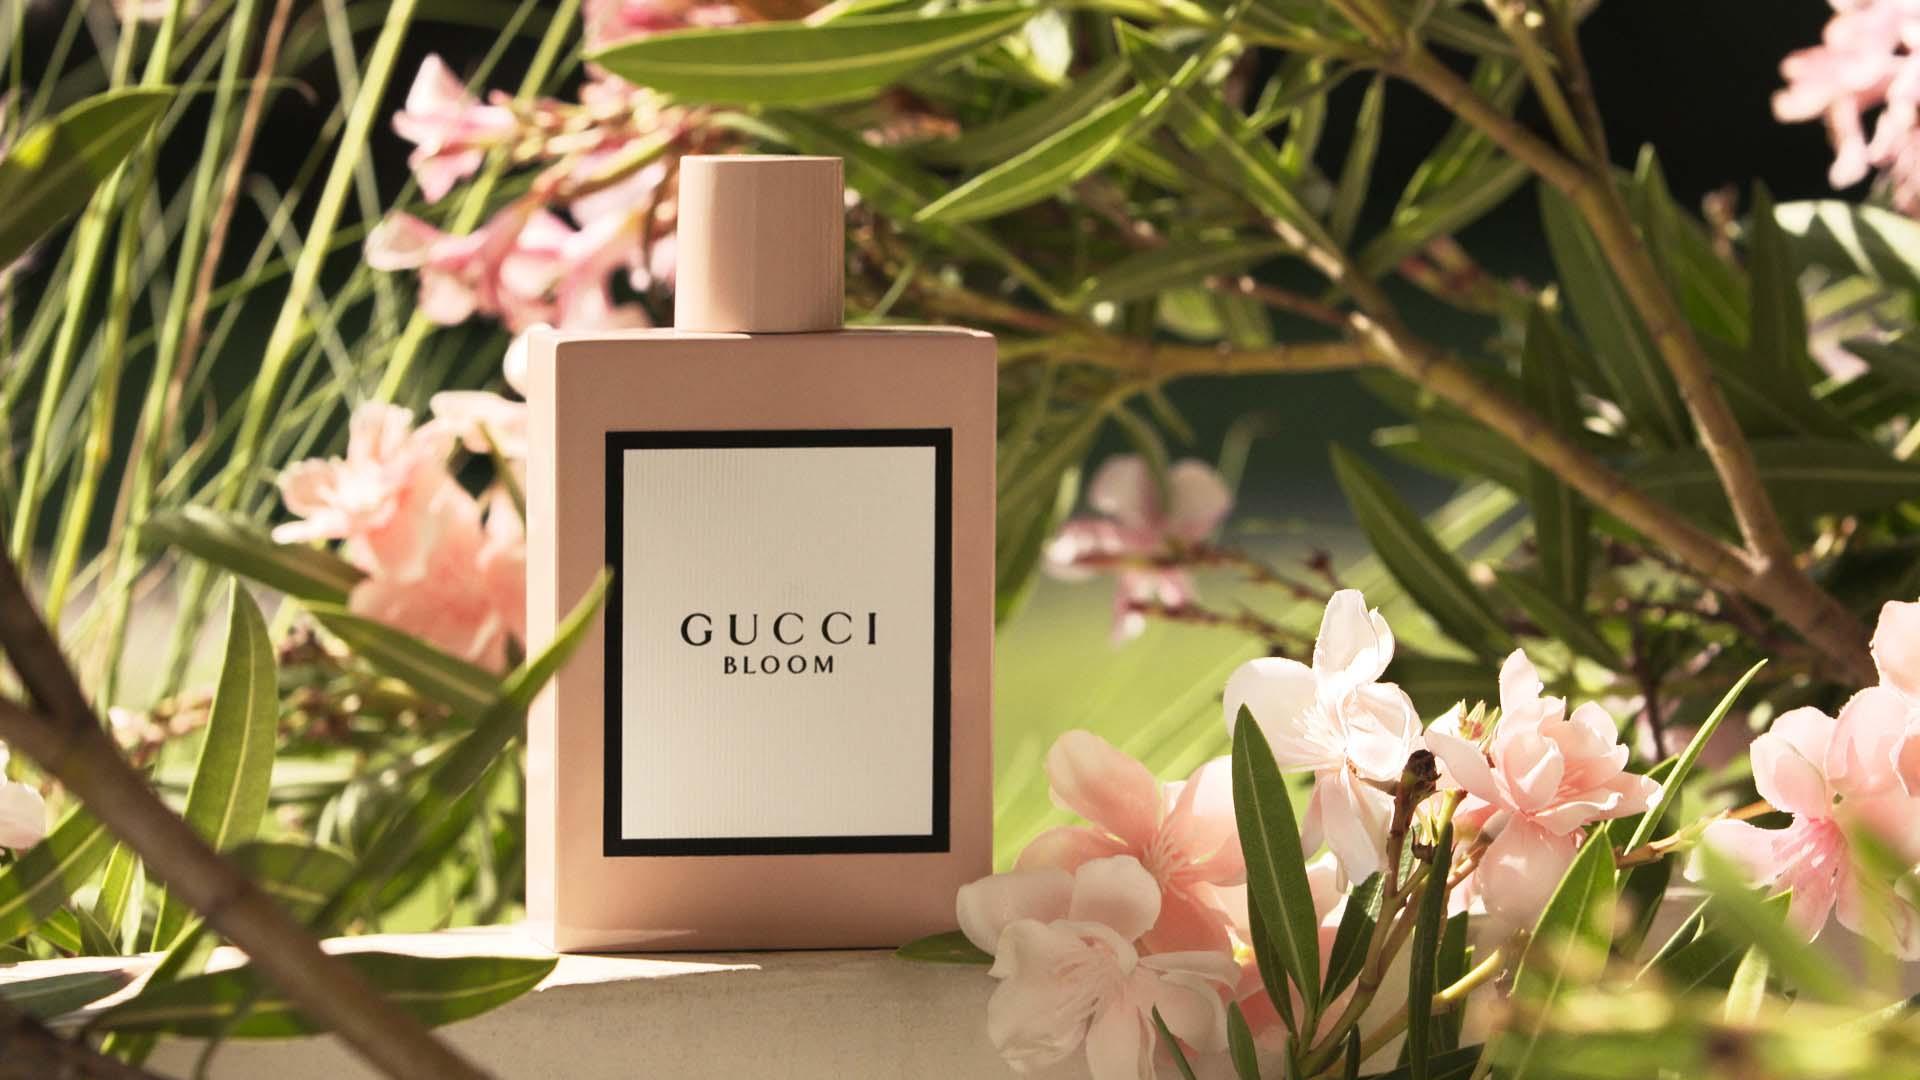 1a363629081f A Sensorial Delight: Alberto Morillas's Gucci Bloom Transports You To A  Magical Garden